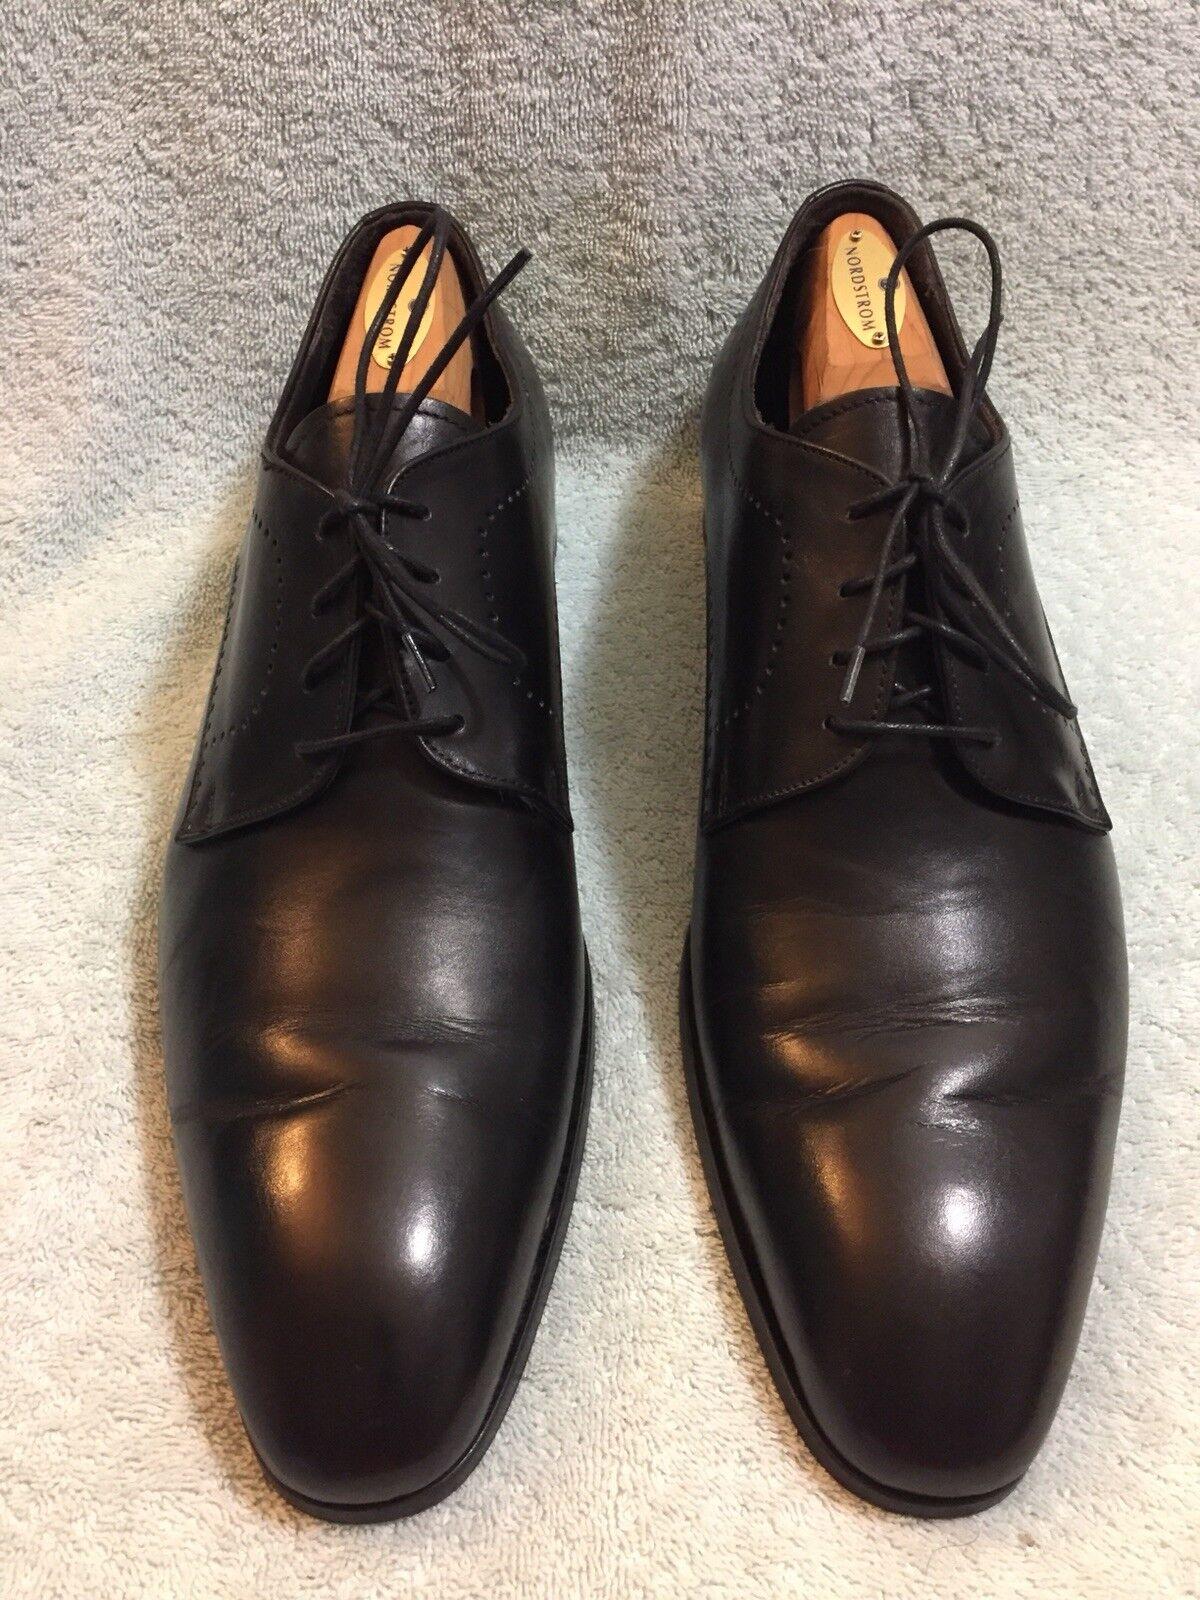 BOCAGE Blake ovinos Oxford Para hombres Zapatos Talla  US 12 Made in